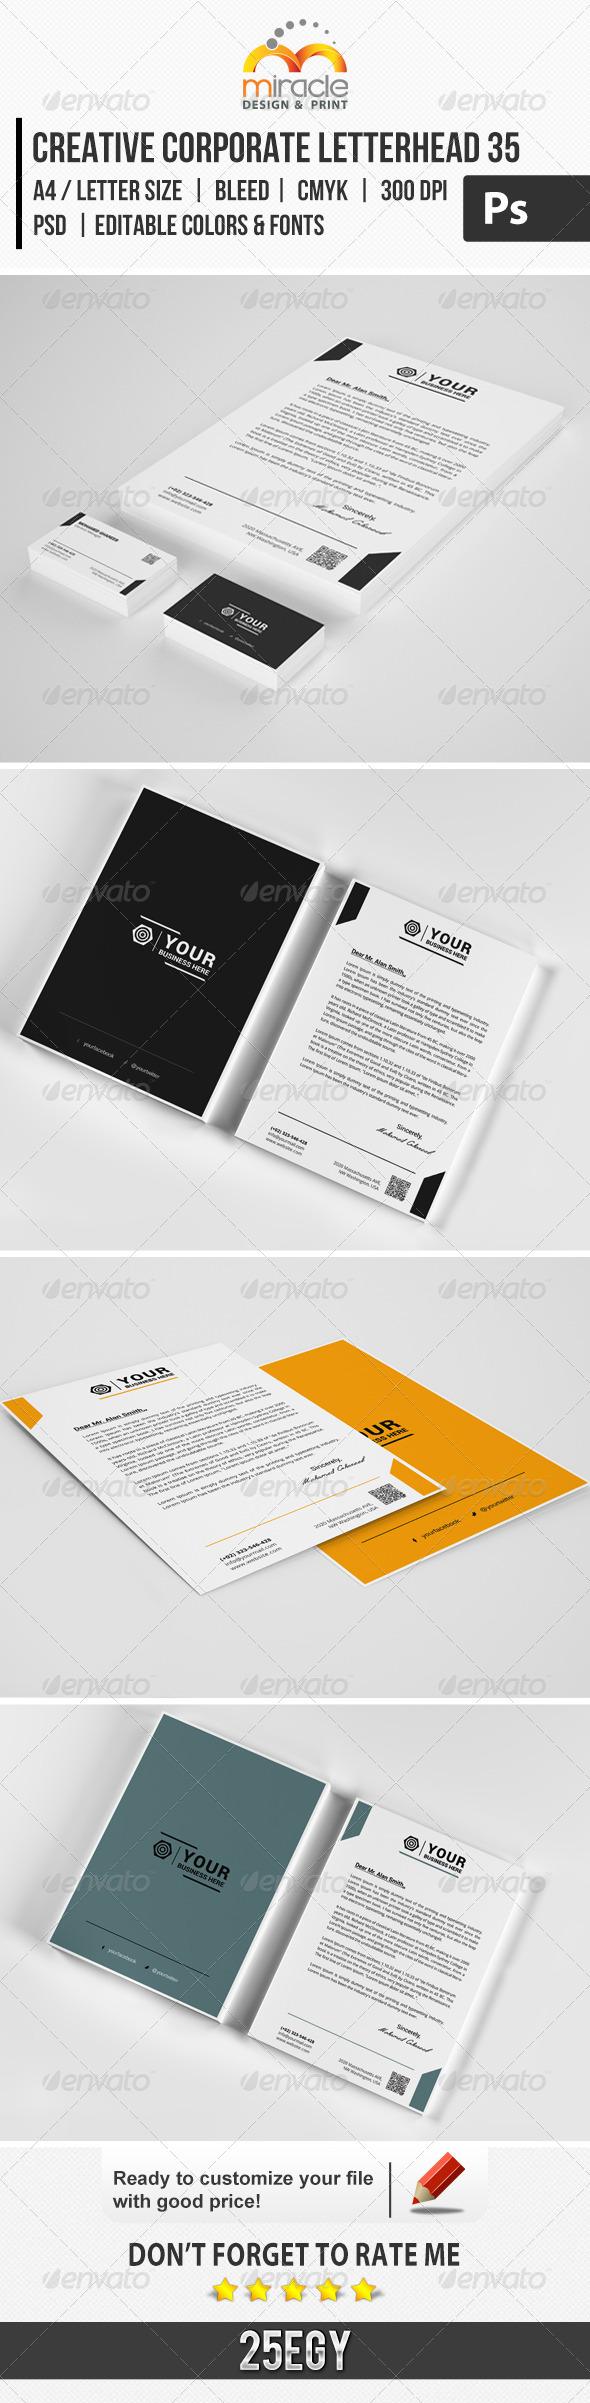 Creative Corporate Letterhead 35 - Stationery Print Templates